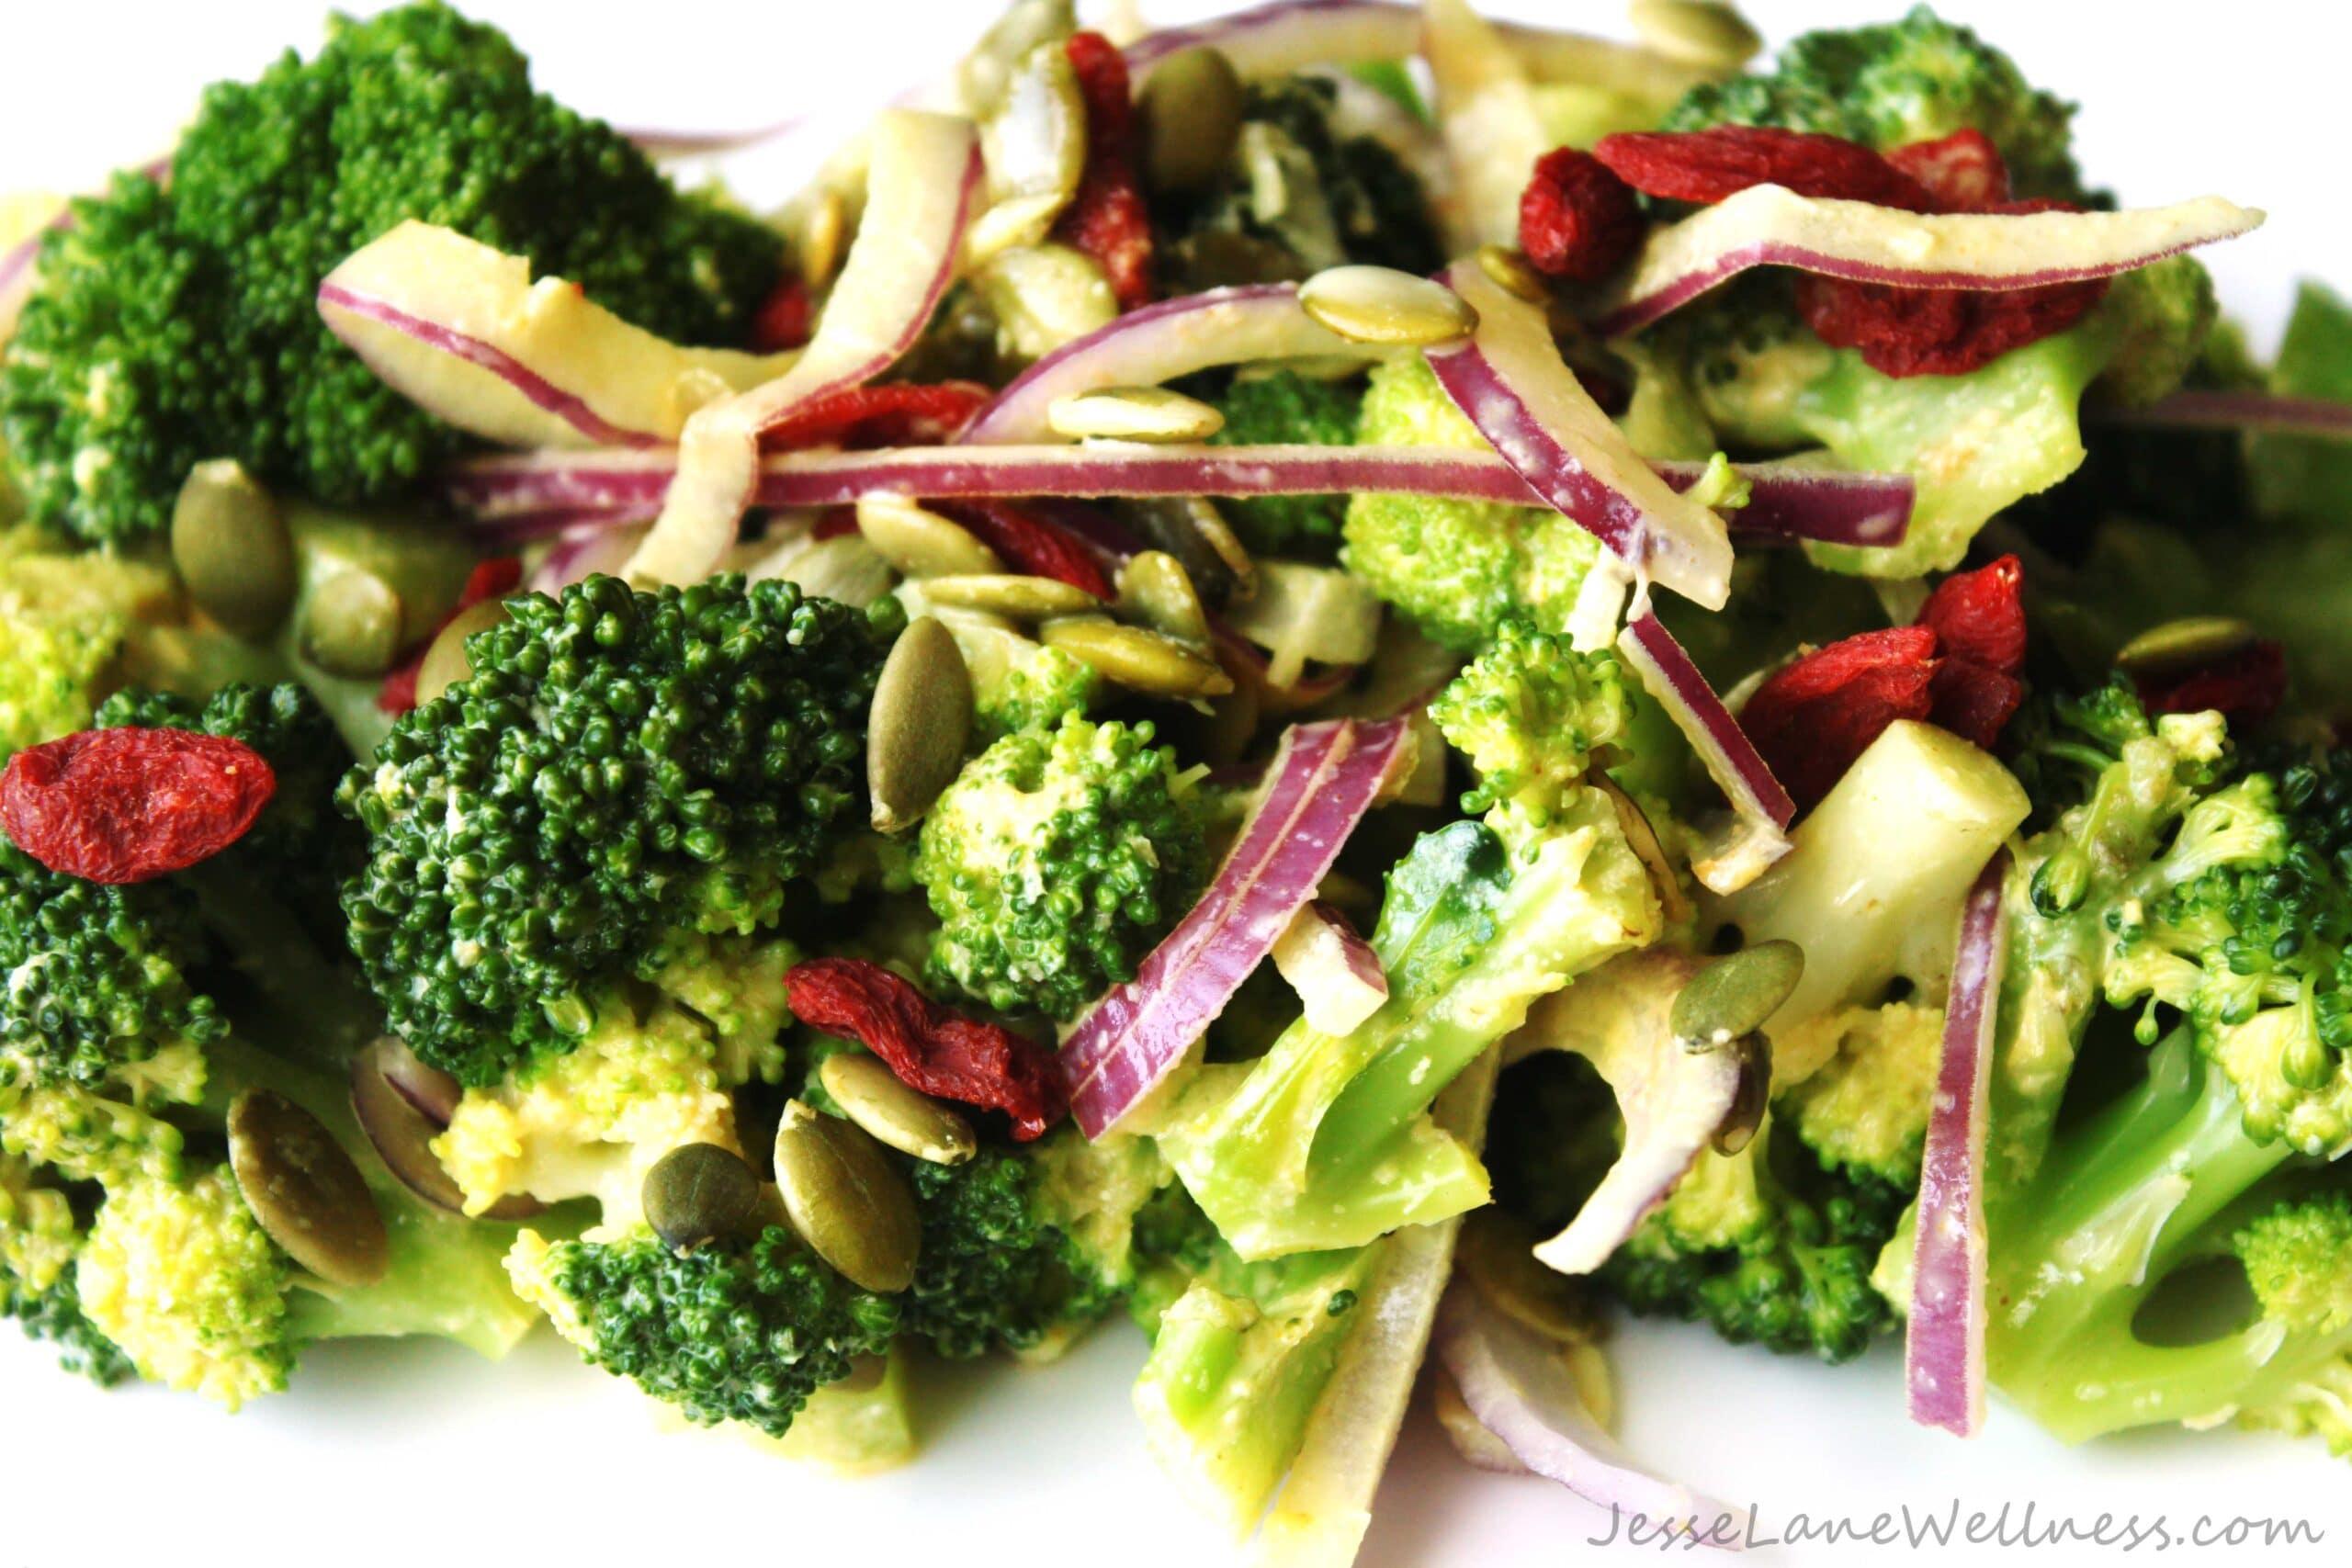 Creamy Broccoli Salad by @JesseLWellness #vegan